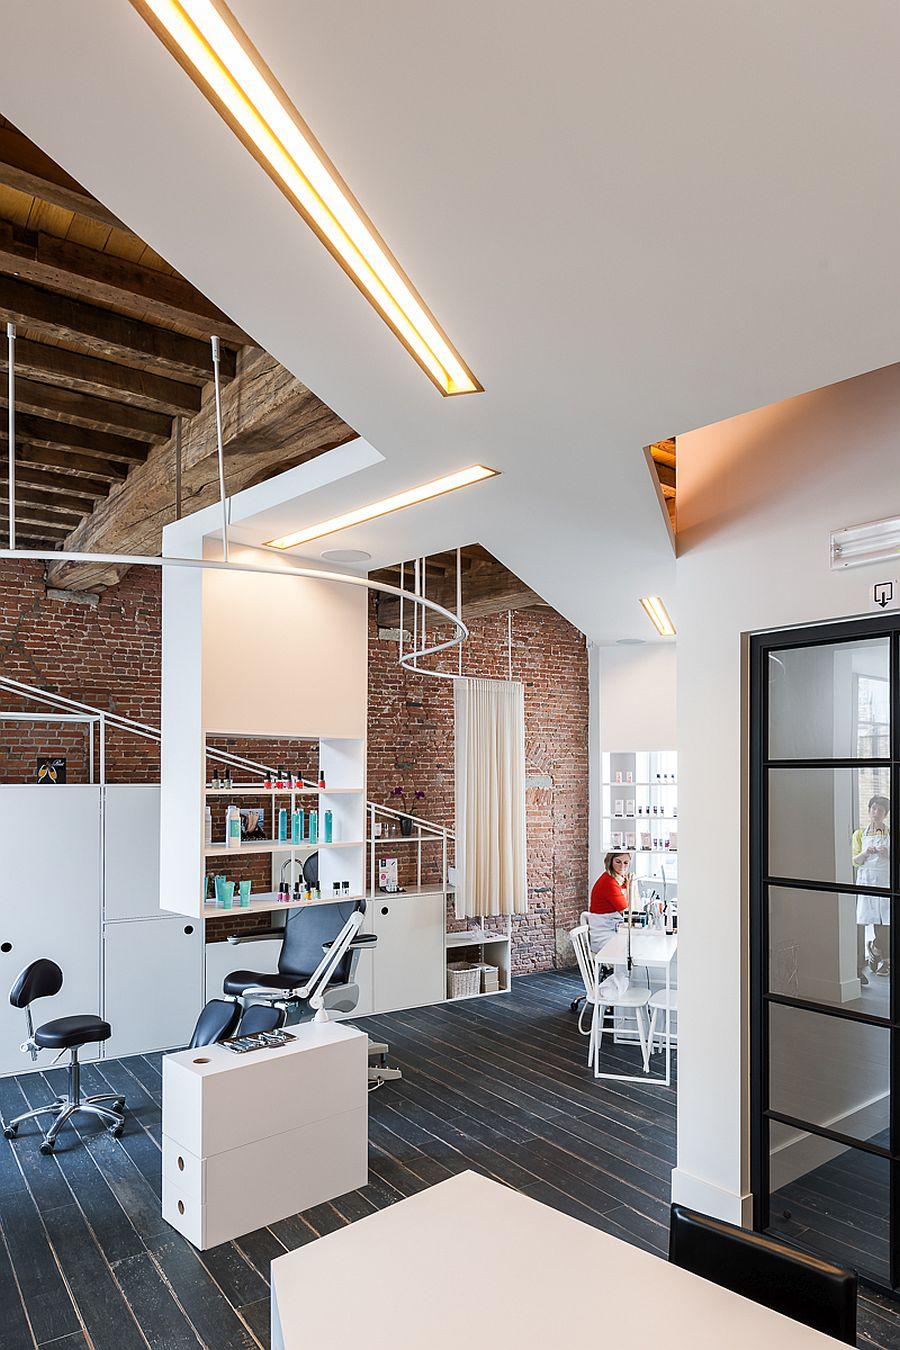 Continuous-white-ceiling-morphs-into-various-decor-pieces